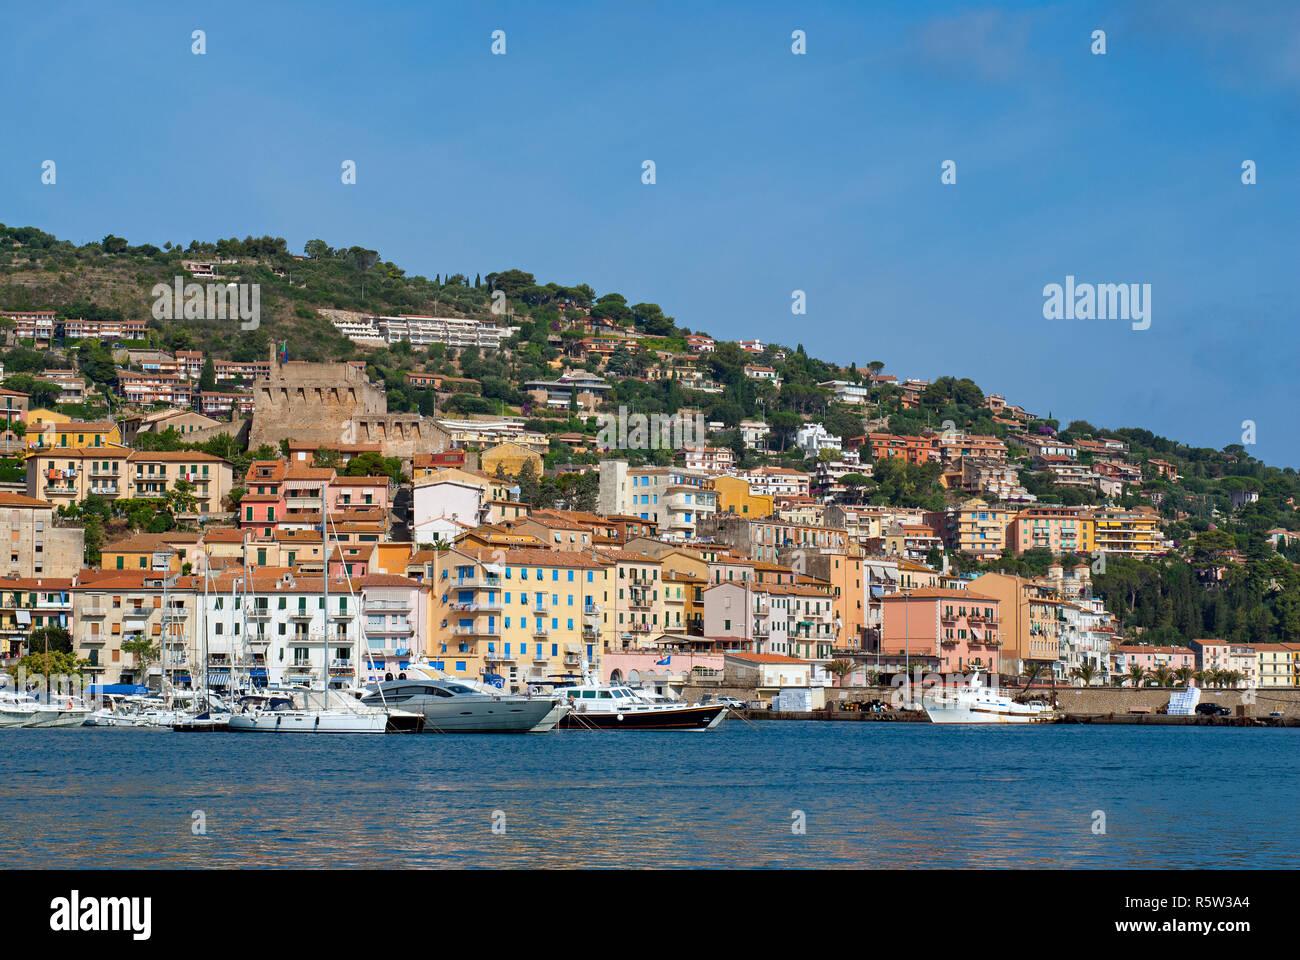 Porto Santo Stefano, Grosseto, Tuscany, Italy - Stock Image